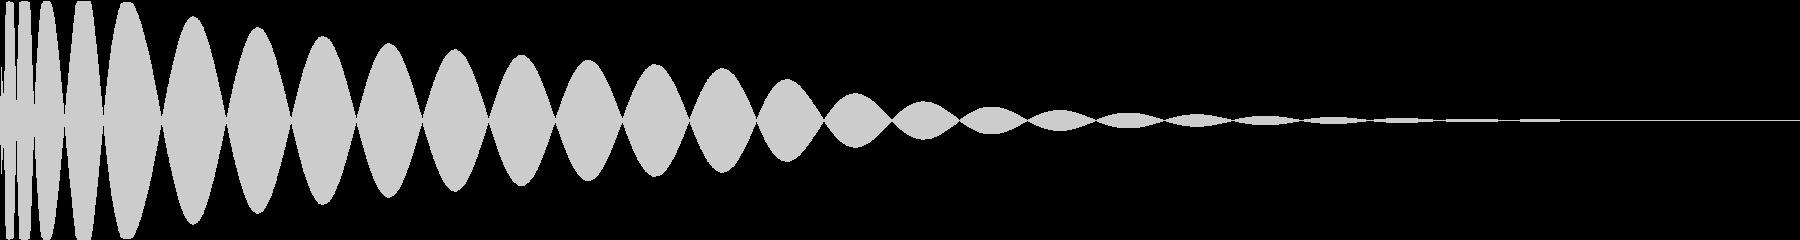 DTM Kick 90 オリジナル音源の未再生の波形